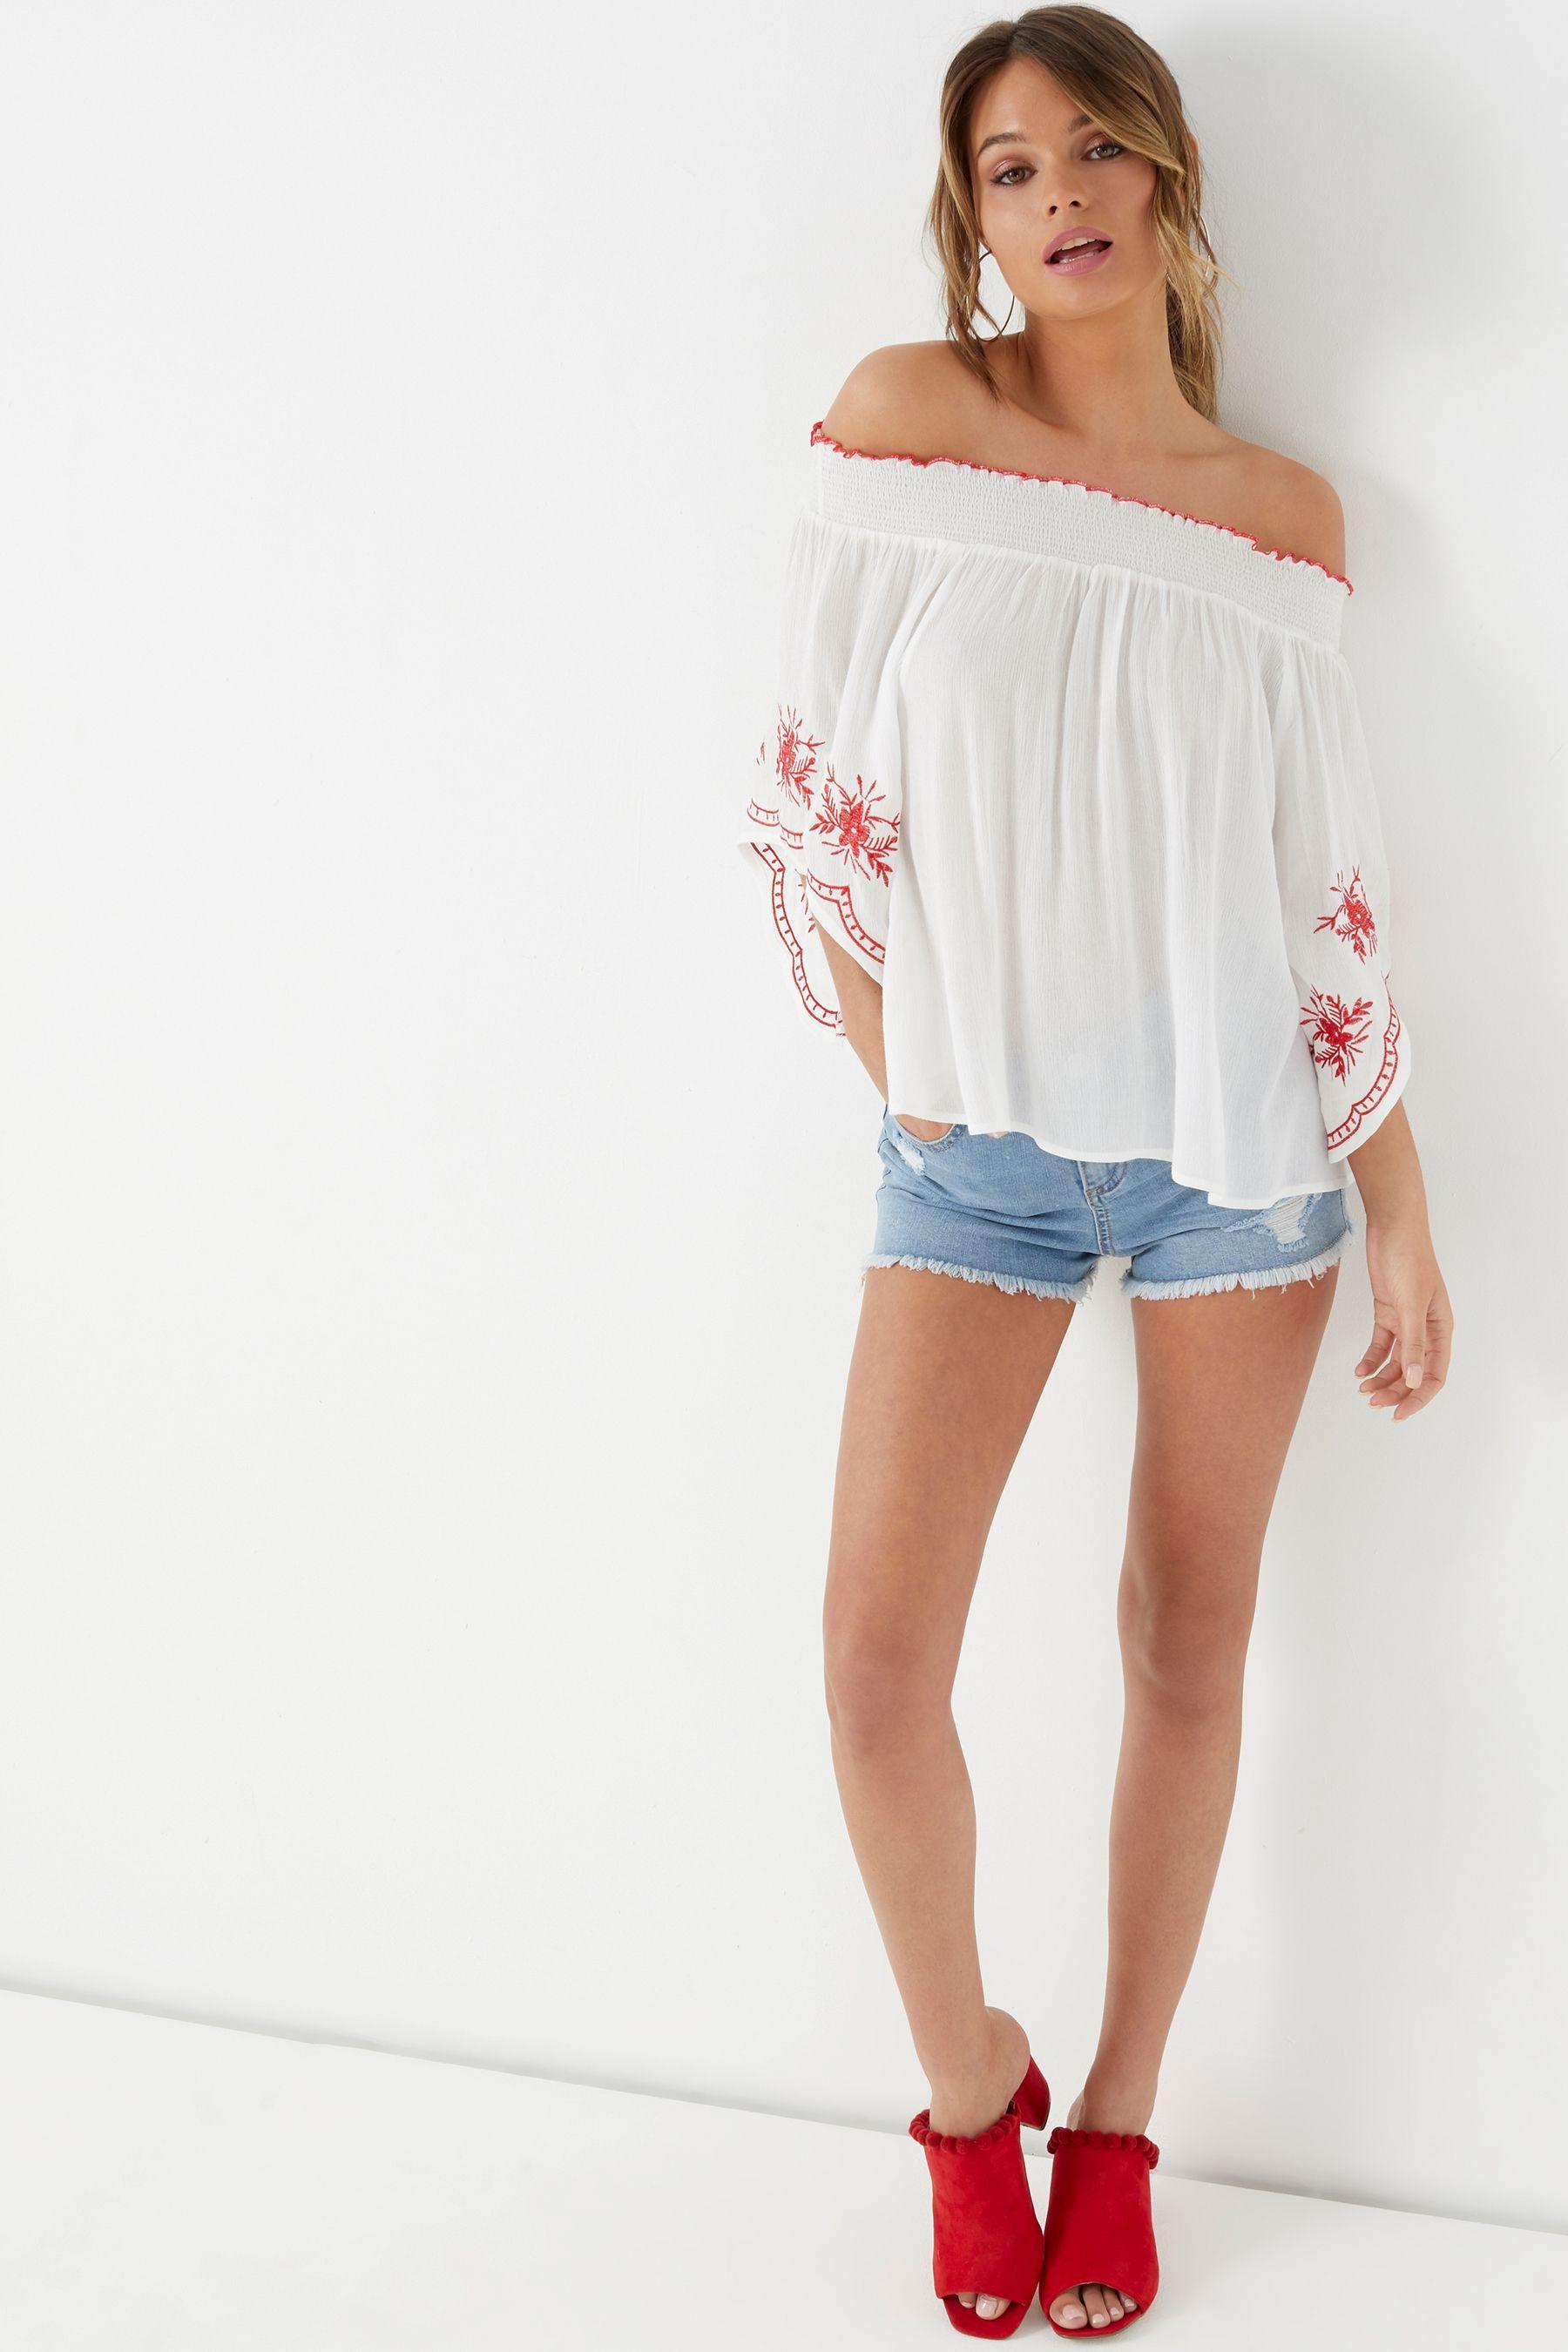 059cfddcbb977d Womens Boohoo Embroidered Sleeve Bardot Top - White